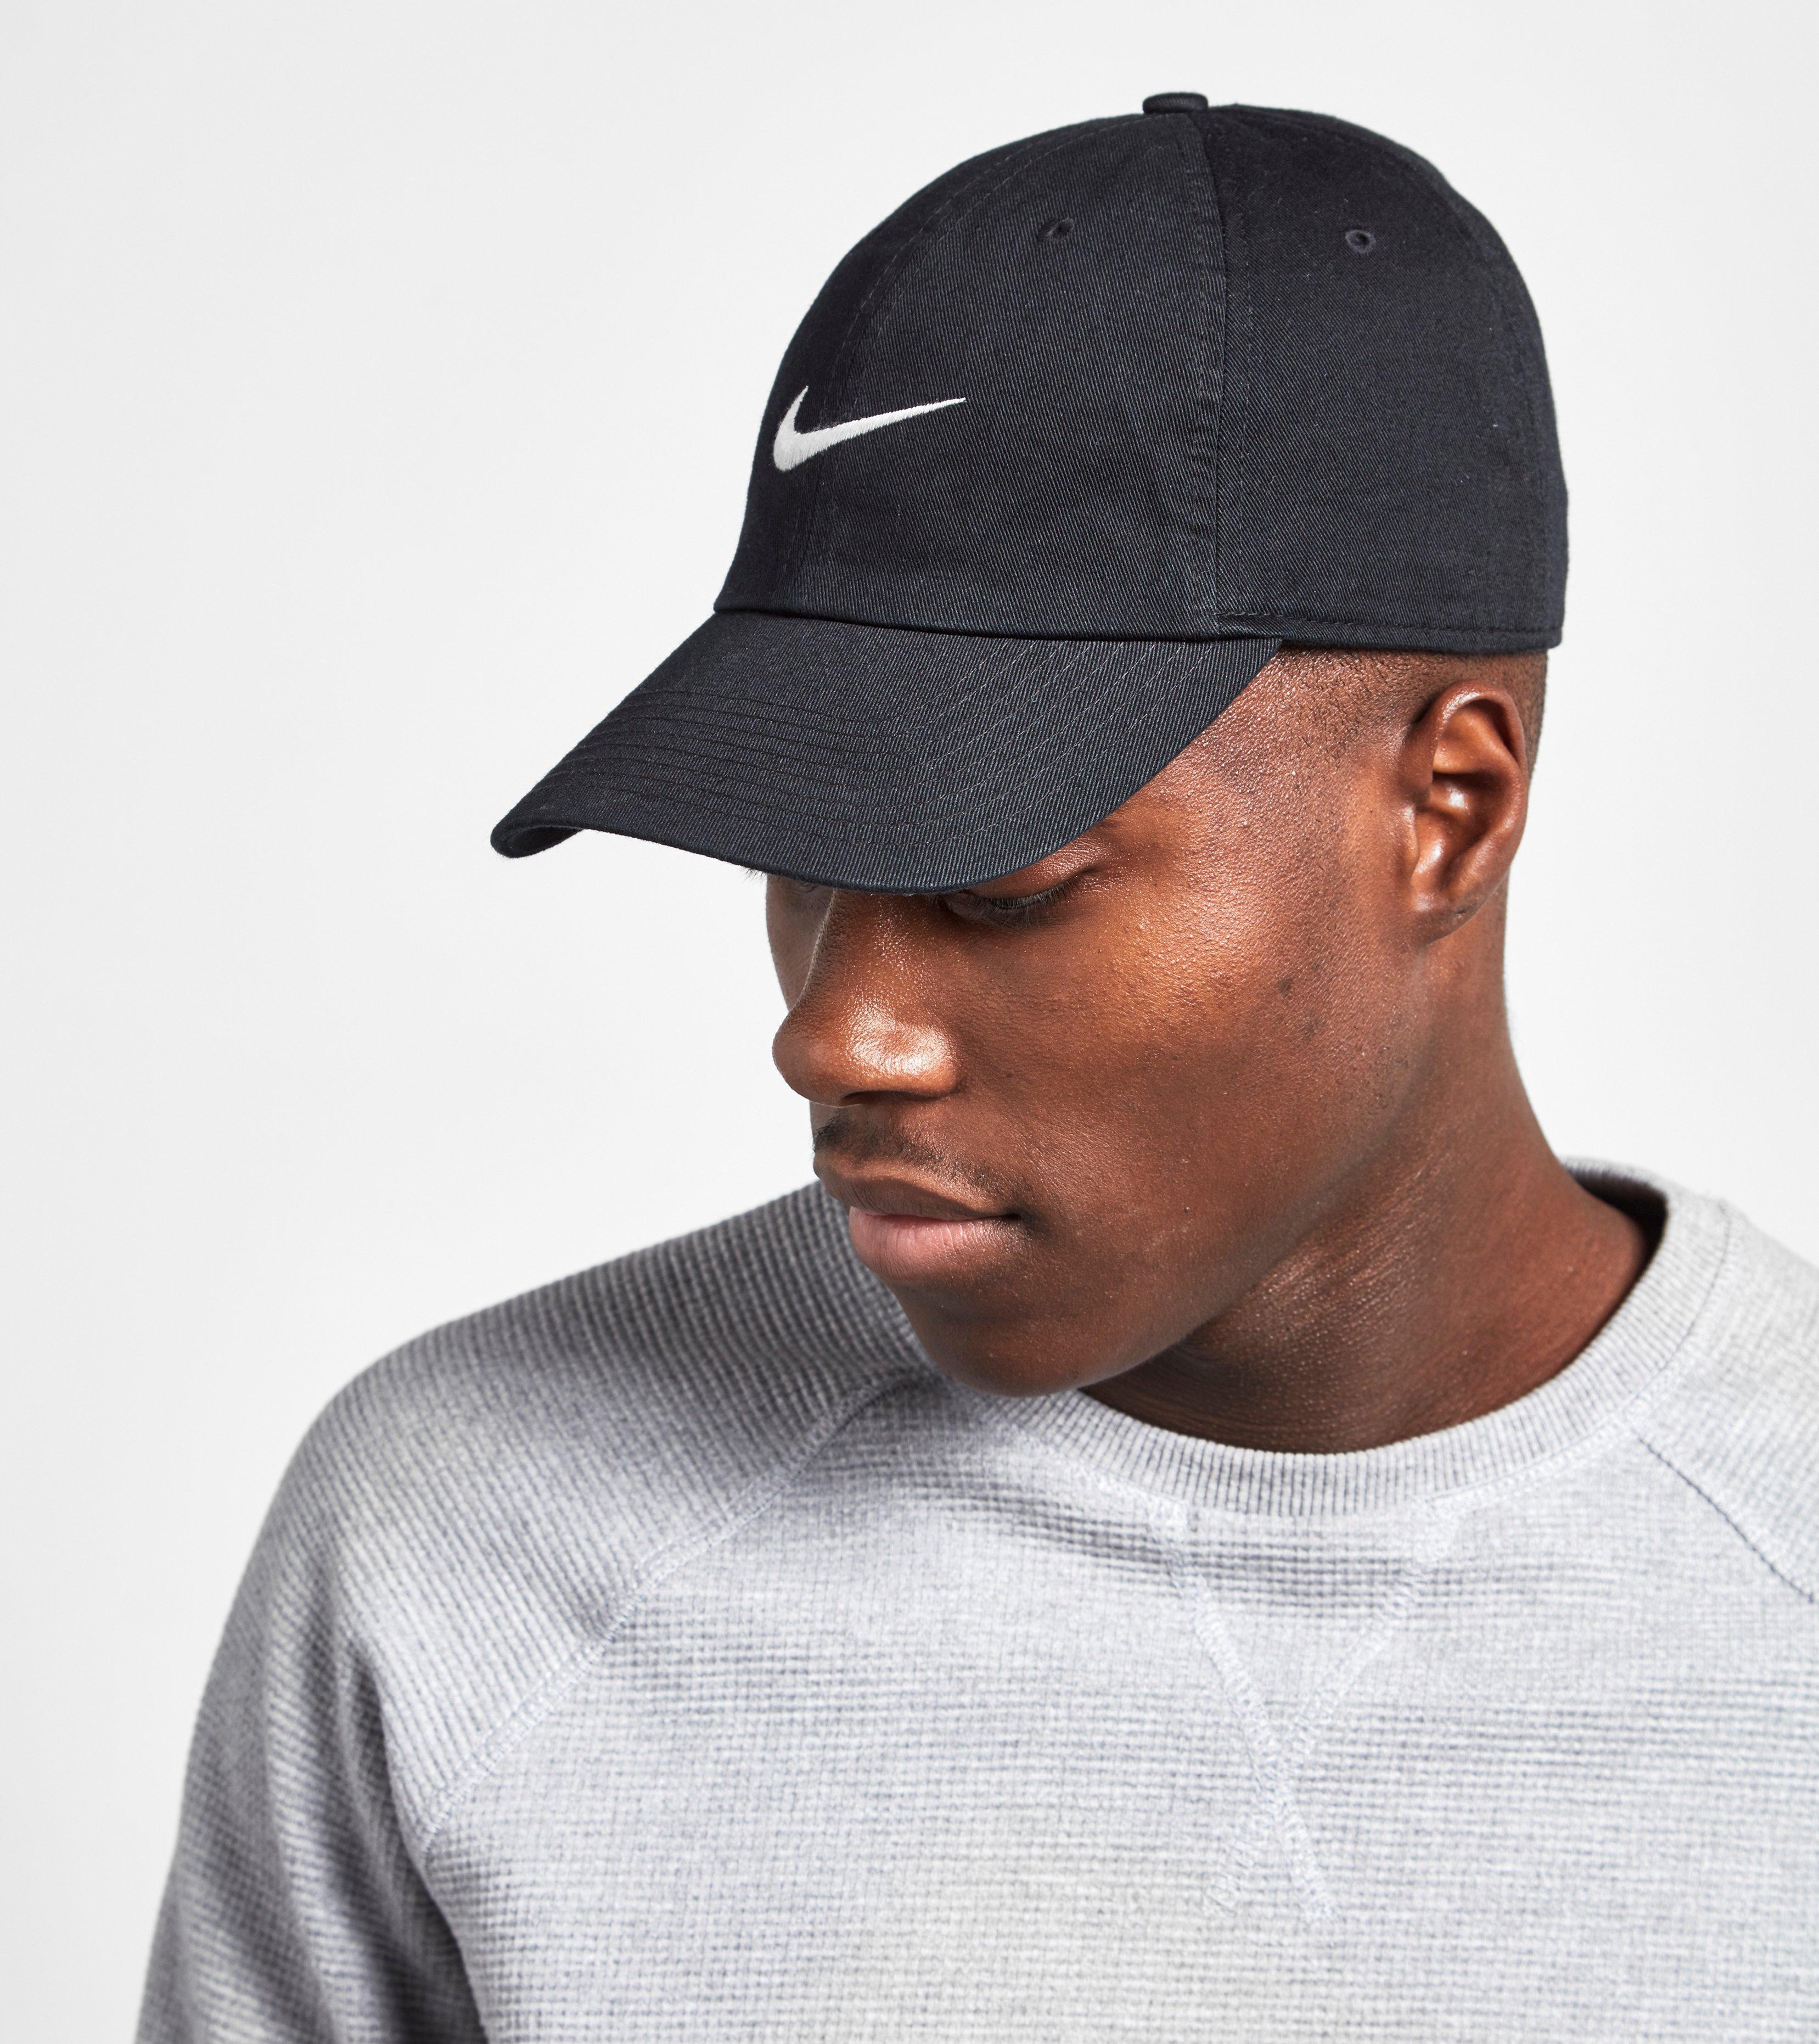 a4035738d Lyst - Nike Heritage Swoosh Cap in Black for Men